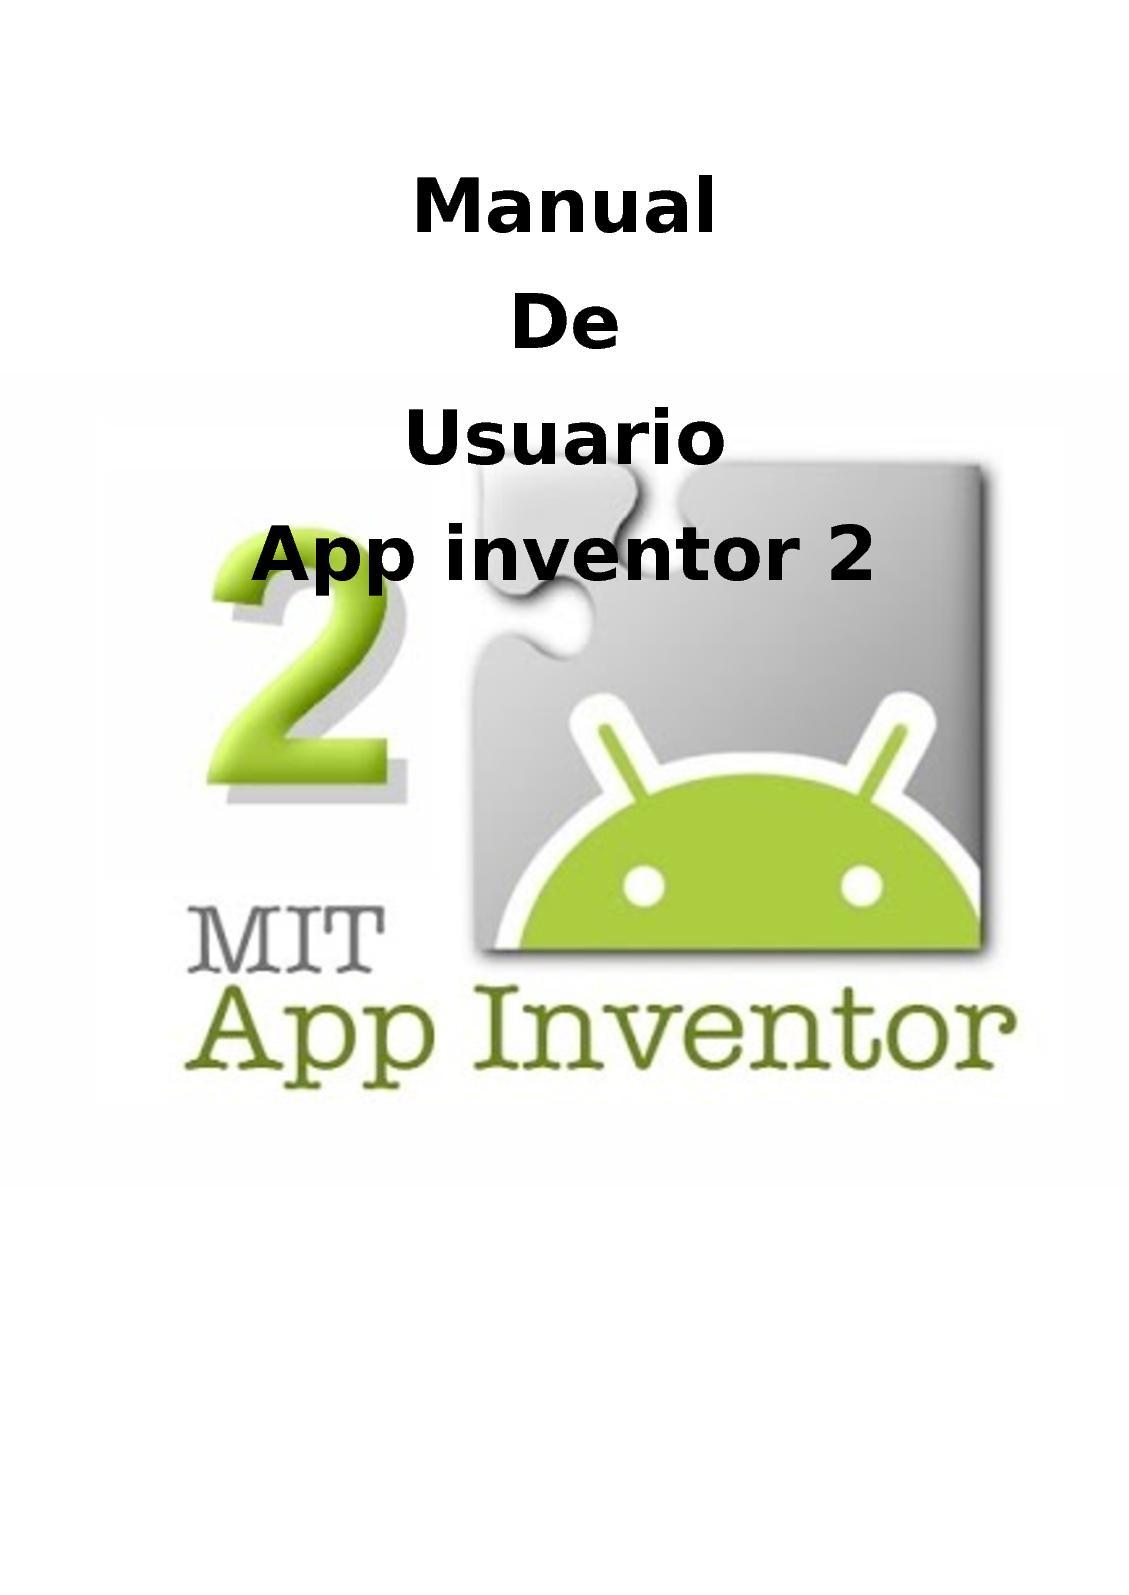 Manual App Inventor 2